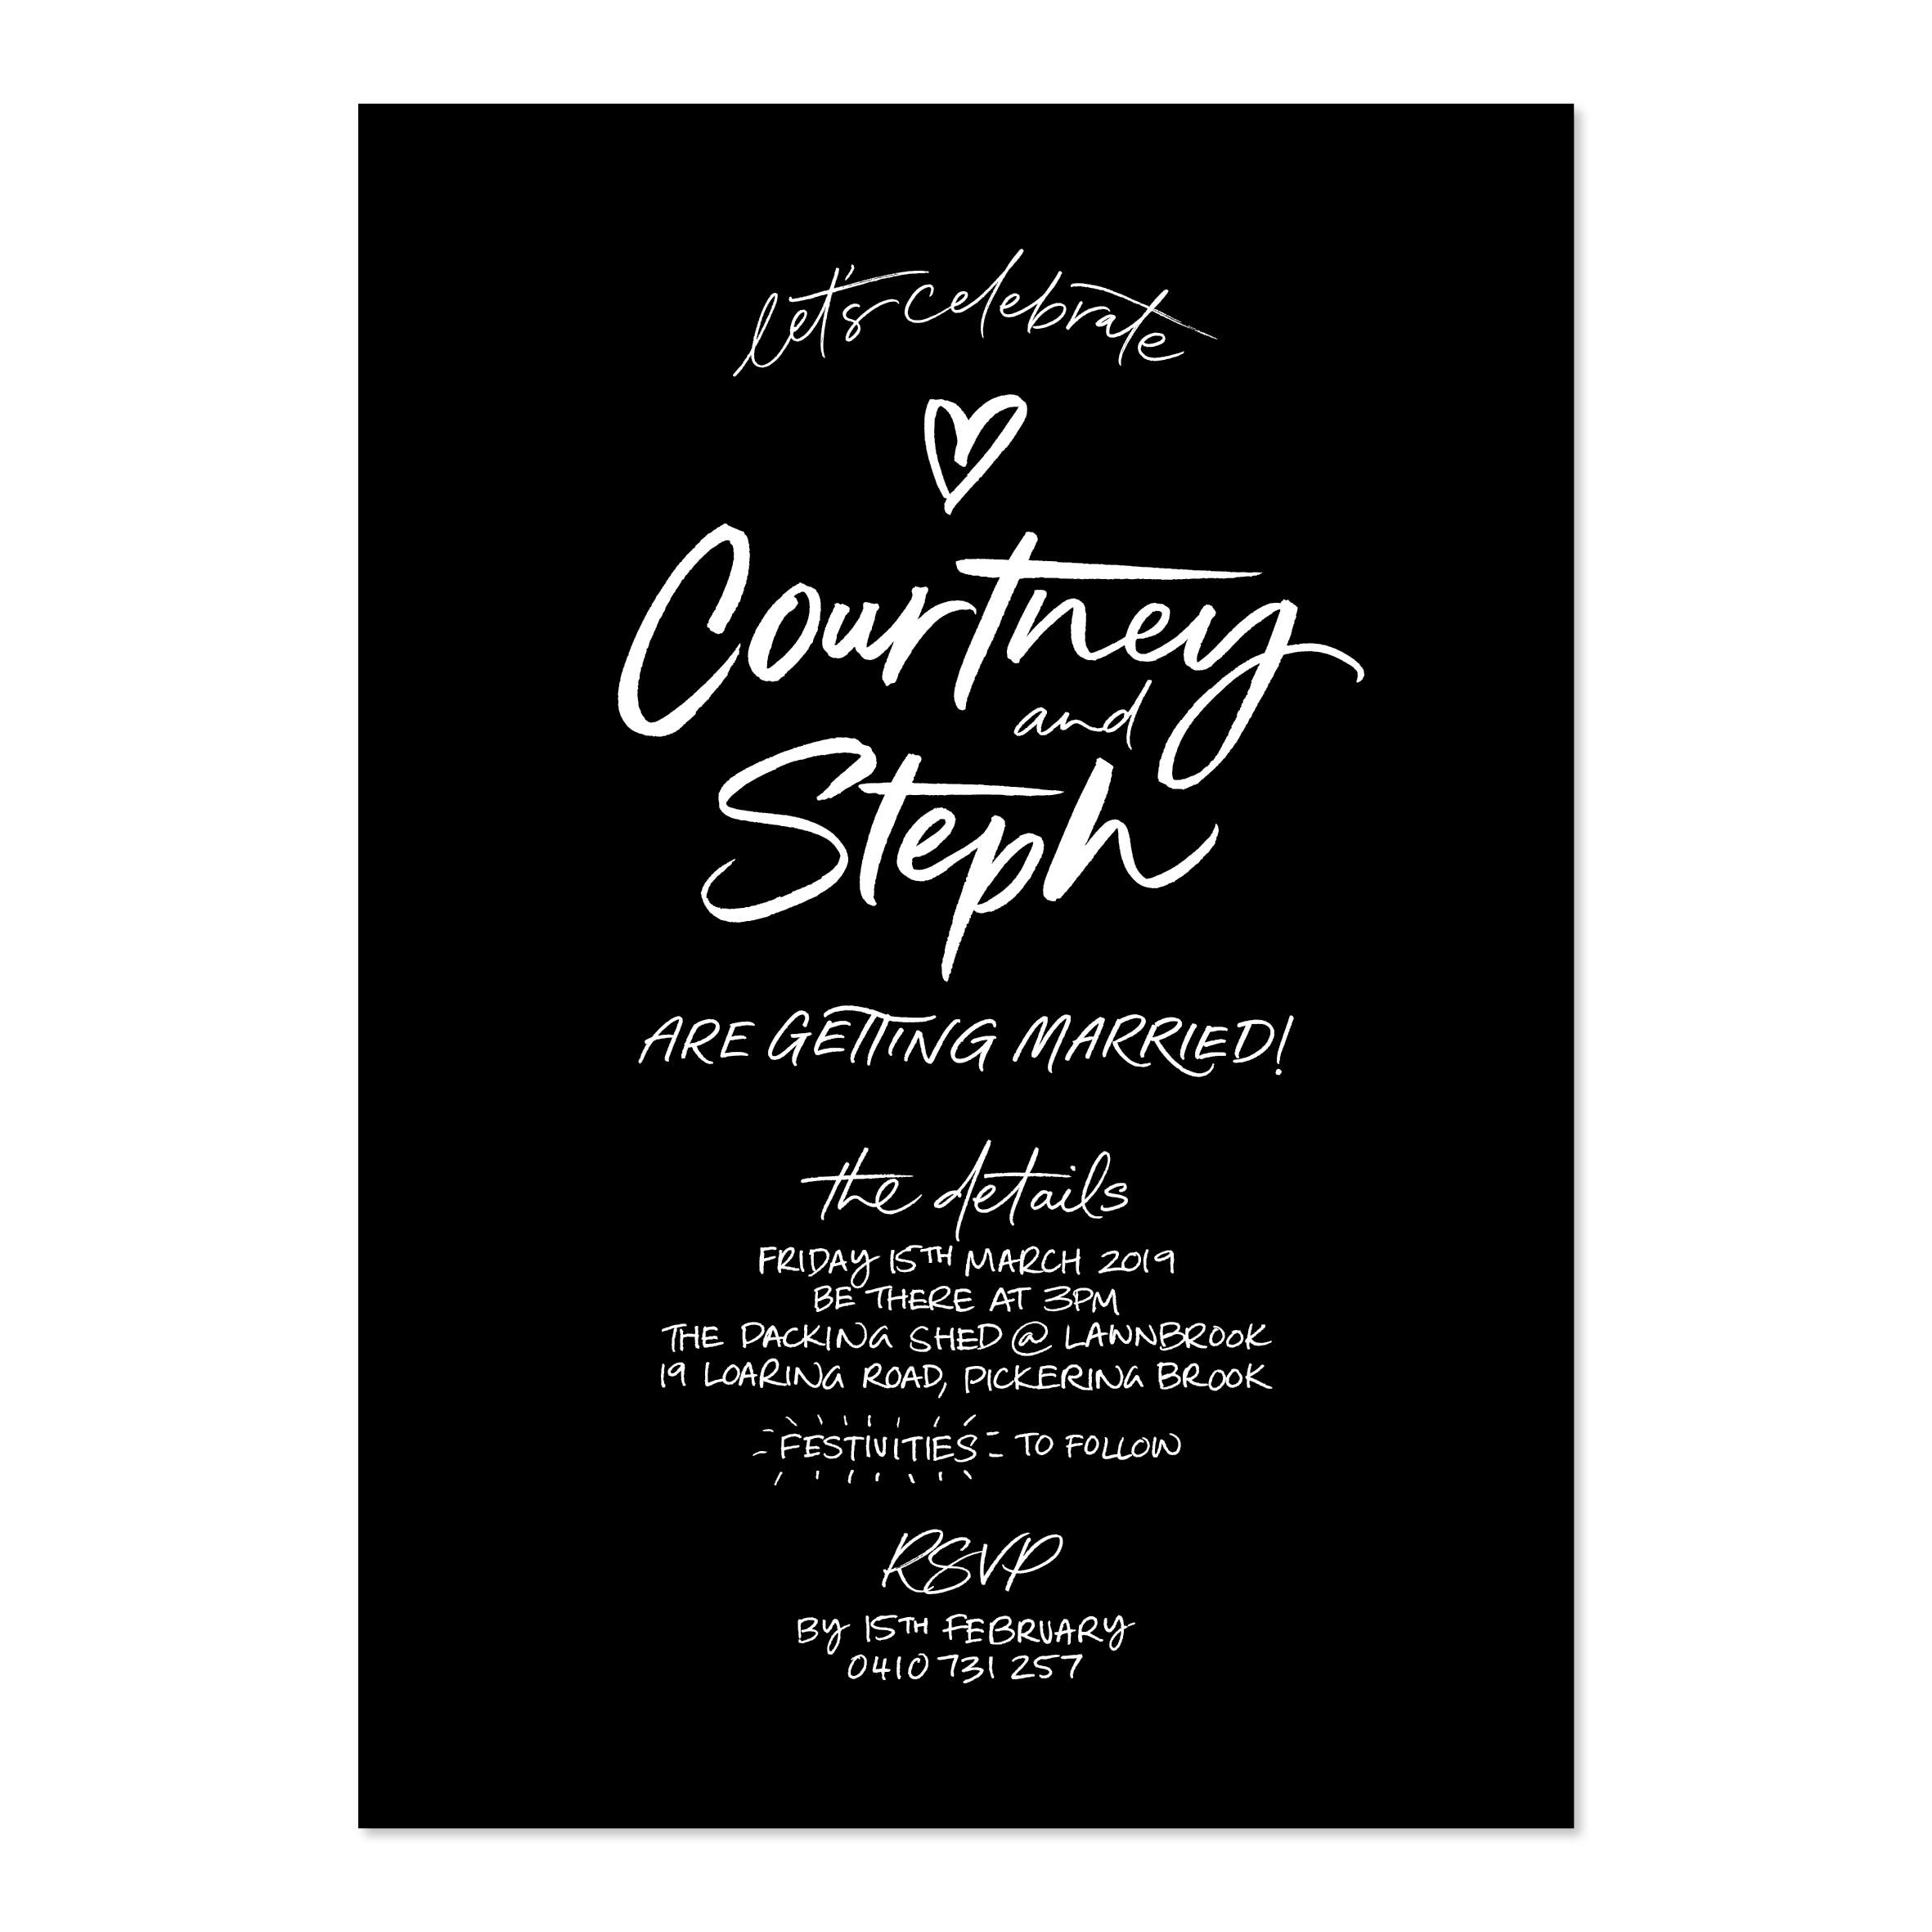 steph & courtney1.jpg